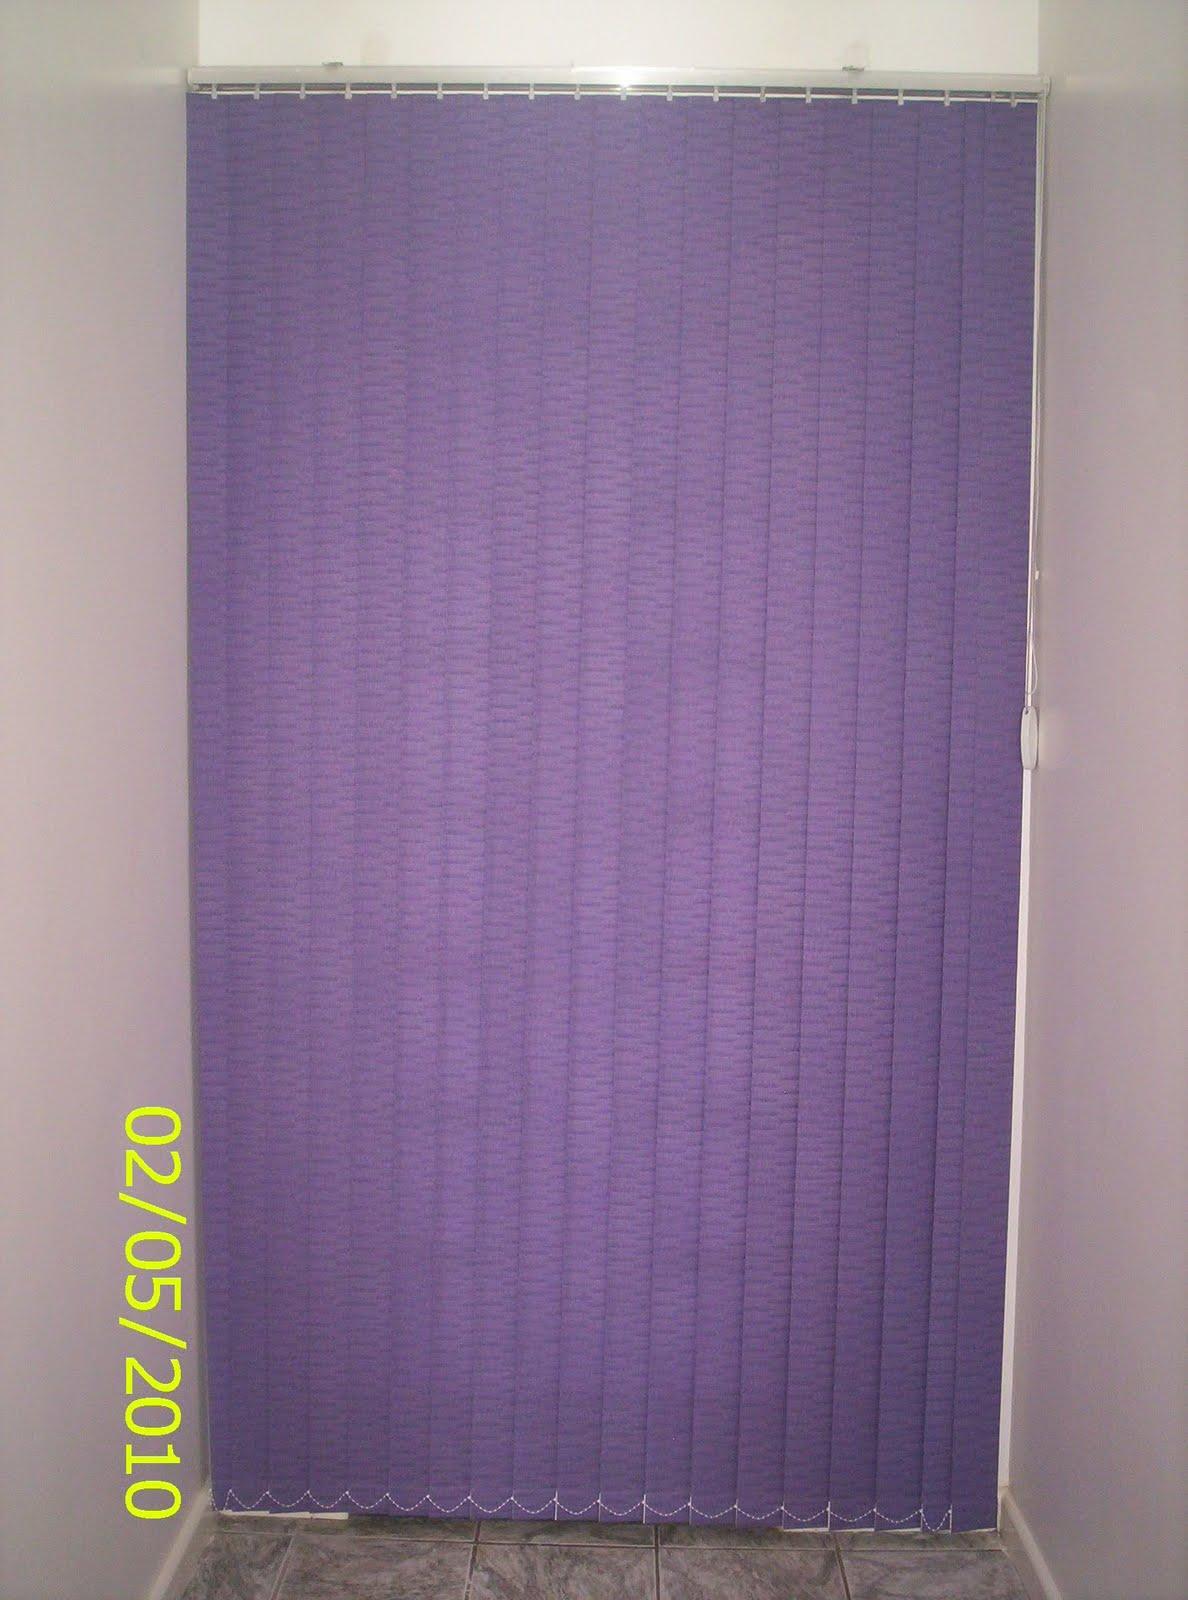 #A4B219 Persiana Vertical de Tecido PVC e Persiana Horizontal de Alumínio 4408 Janela Aluminio Maxiar